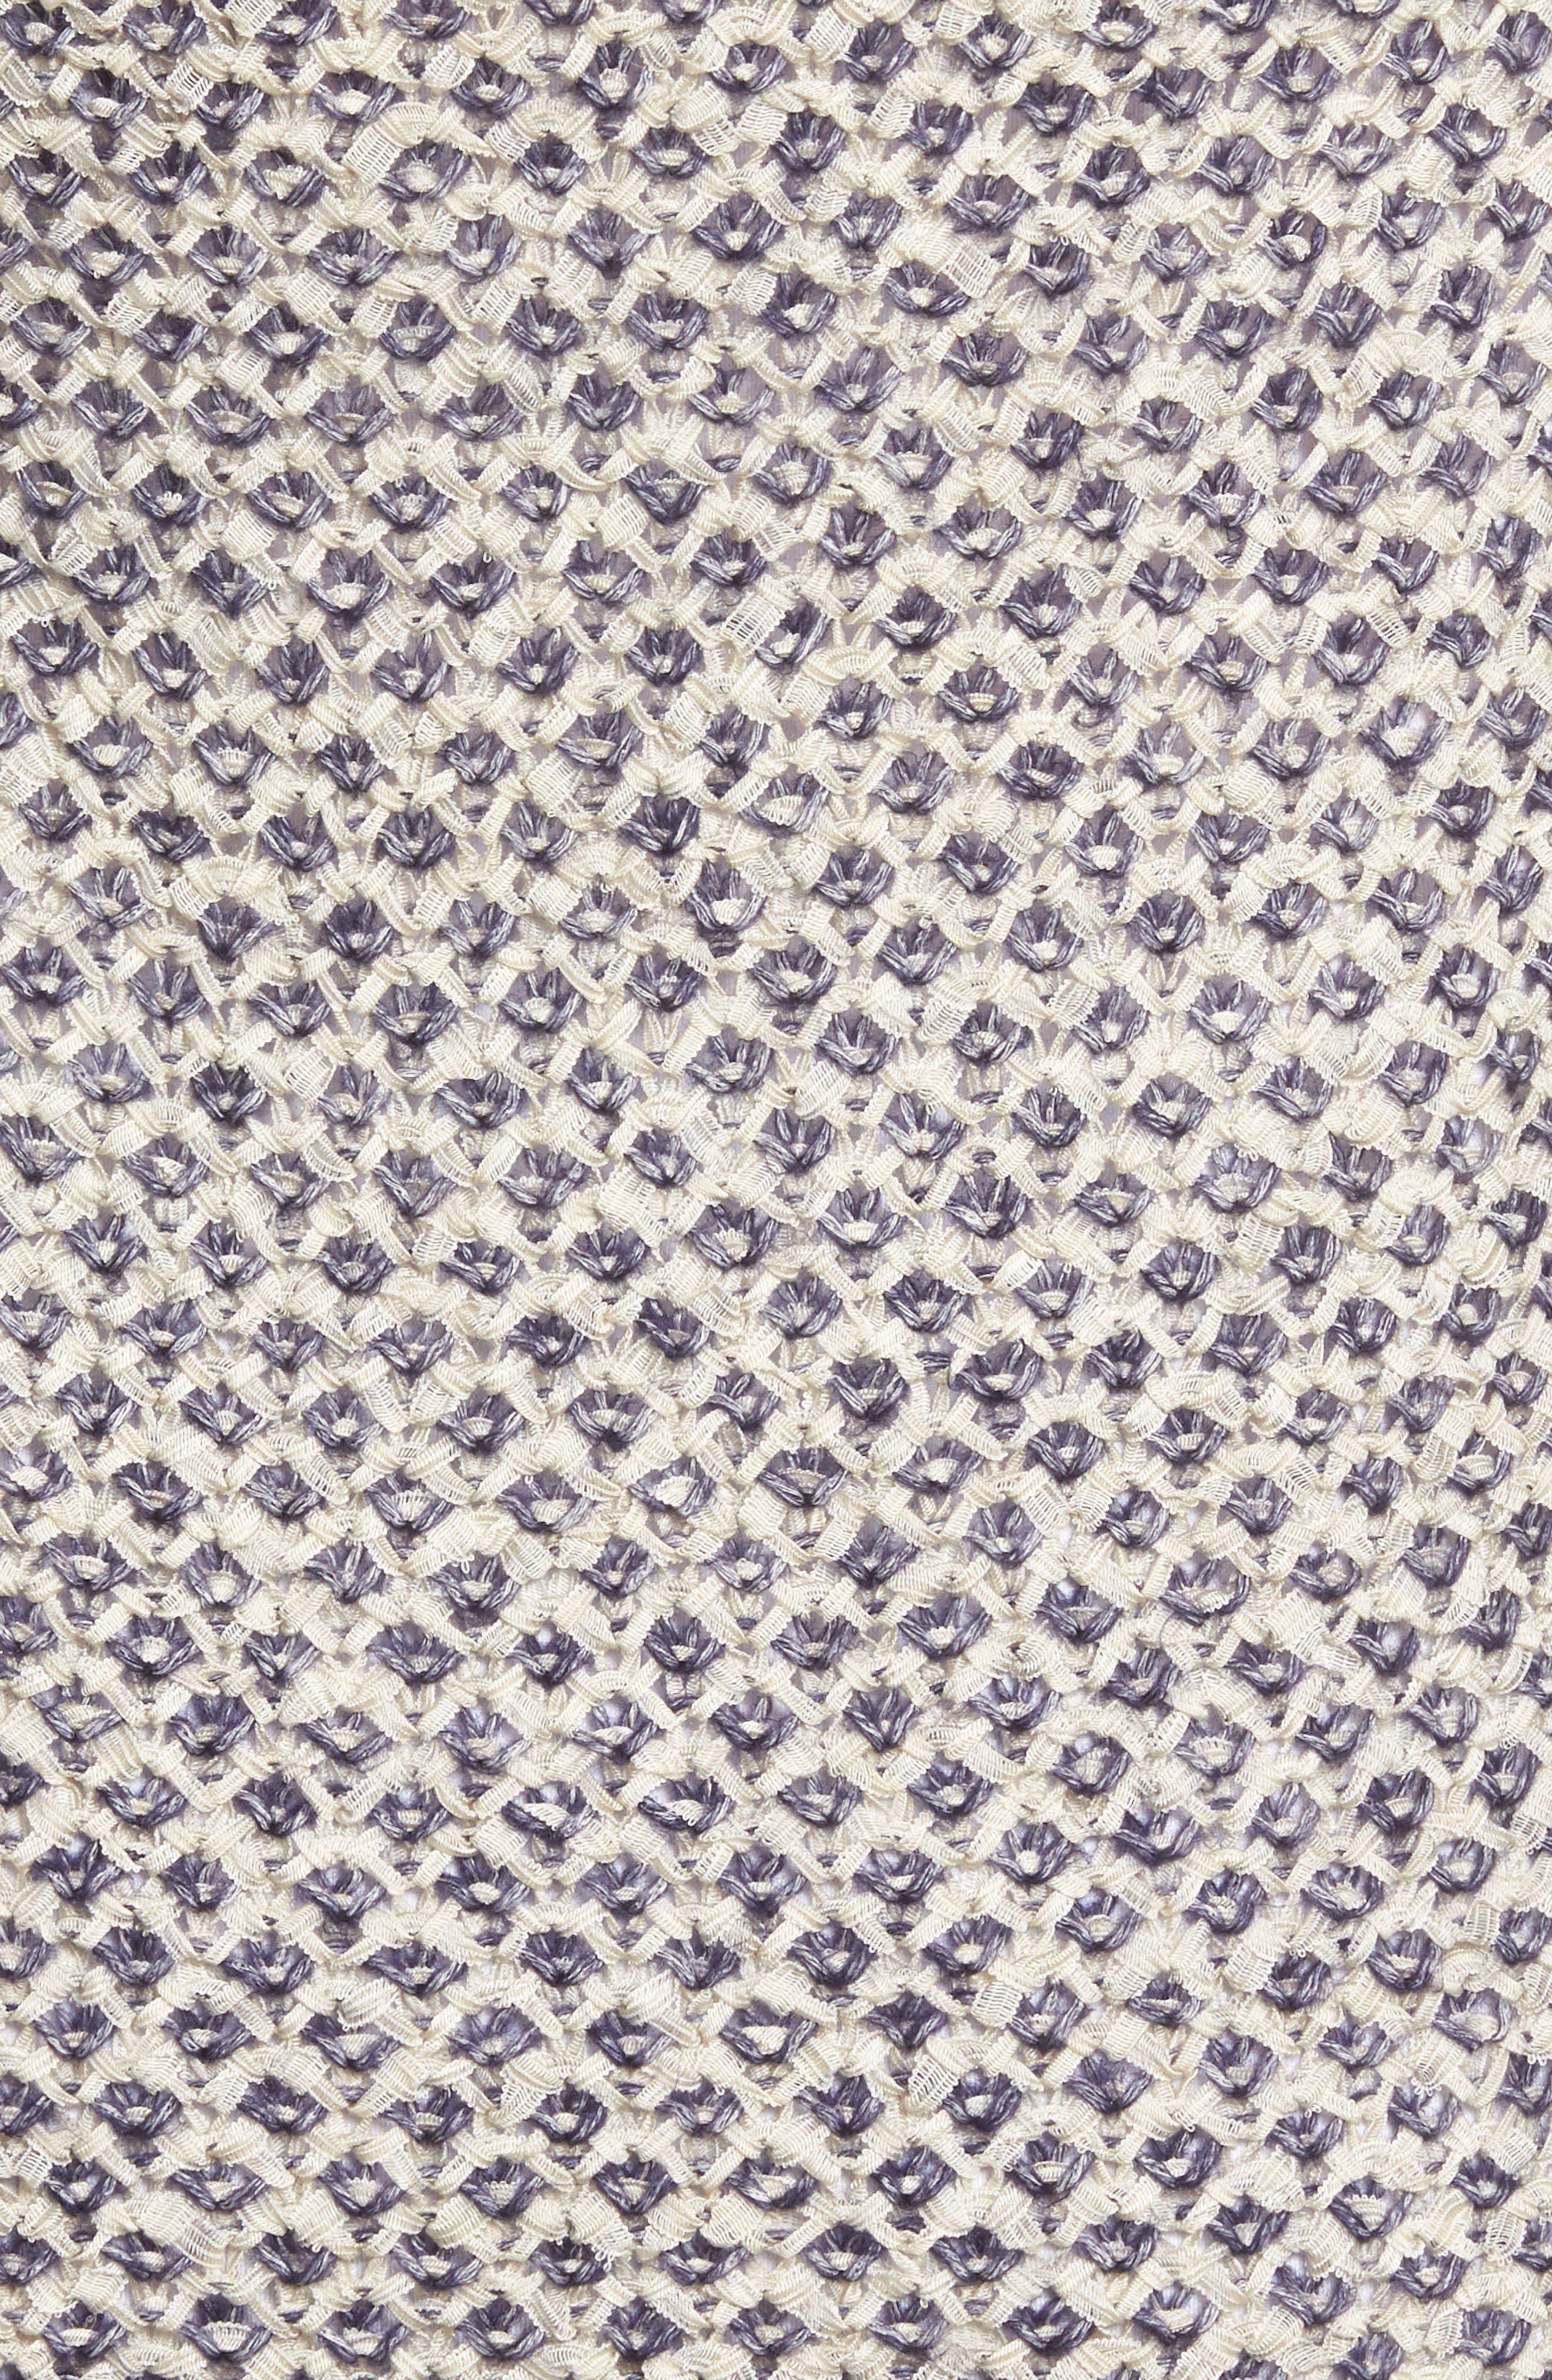 Textured Boyfriend Cardigan,                             Alternate thumbnail 5, color,                             IVORY- NAVY PATTERN